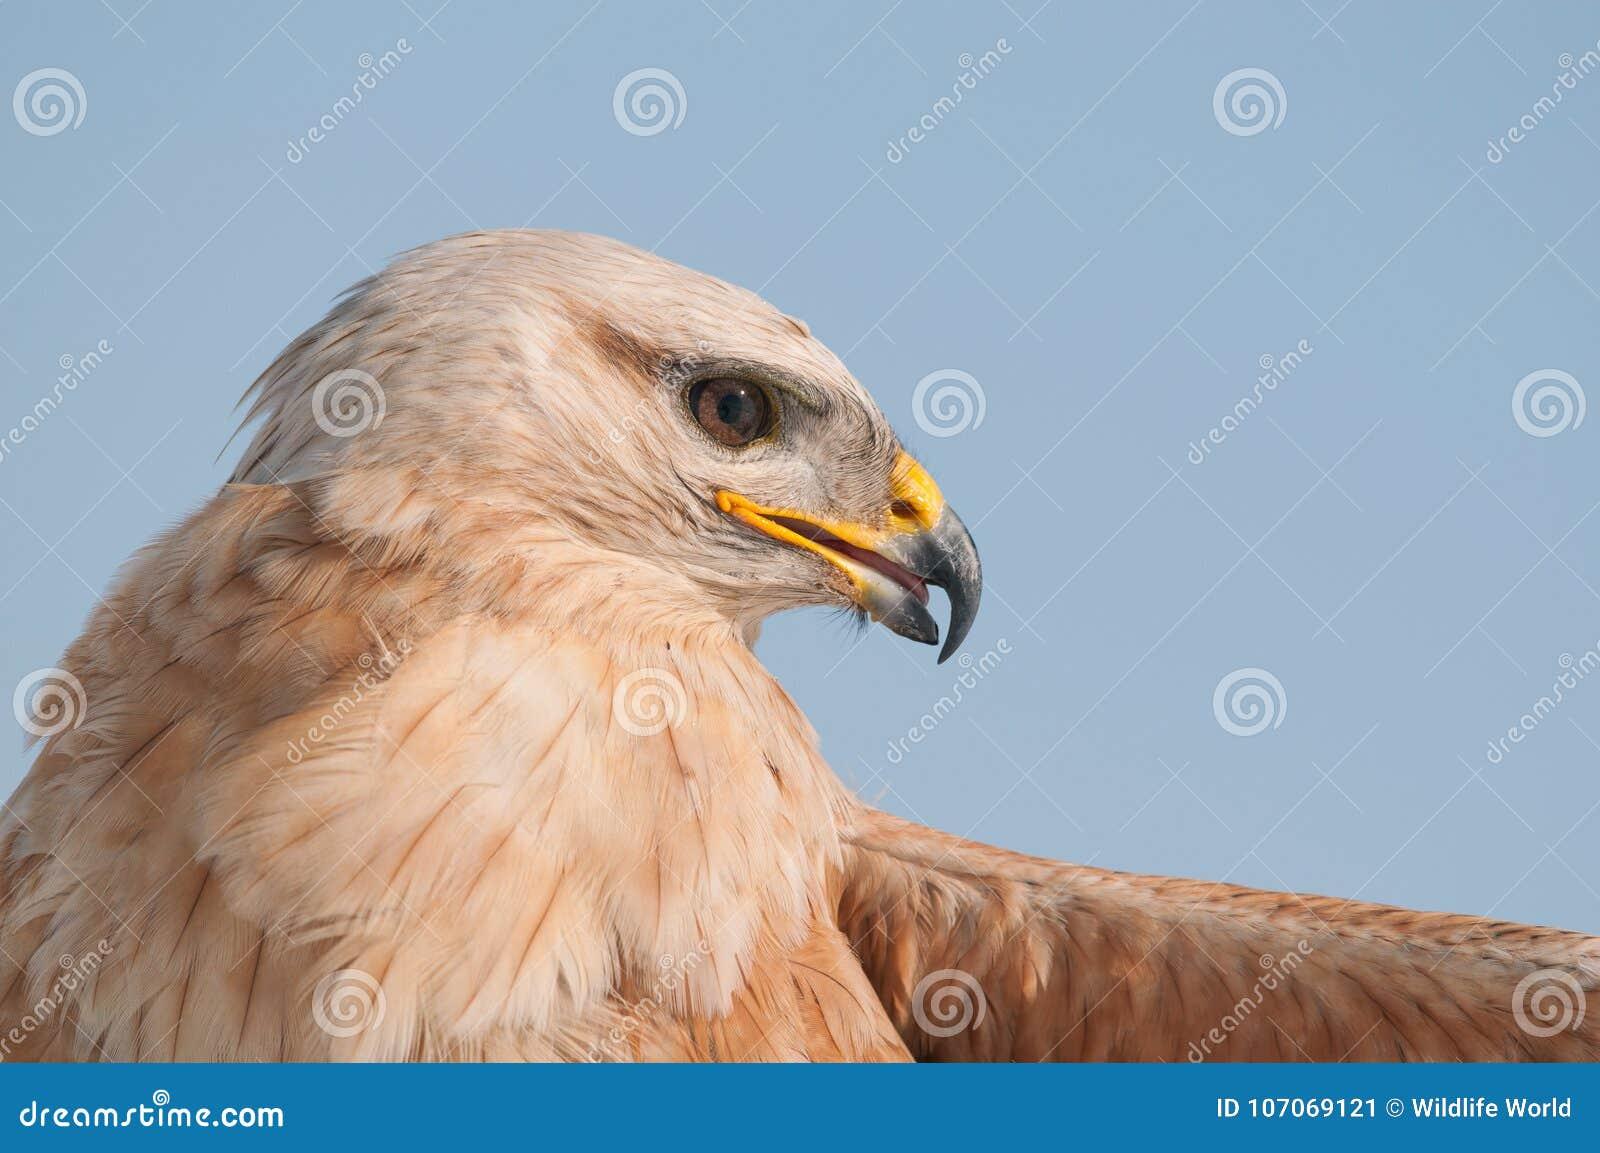 Birds of prey - Common Buzzard Buteo buteo in the sky. Close Up